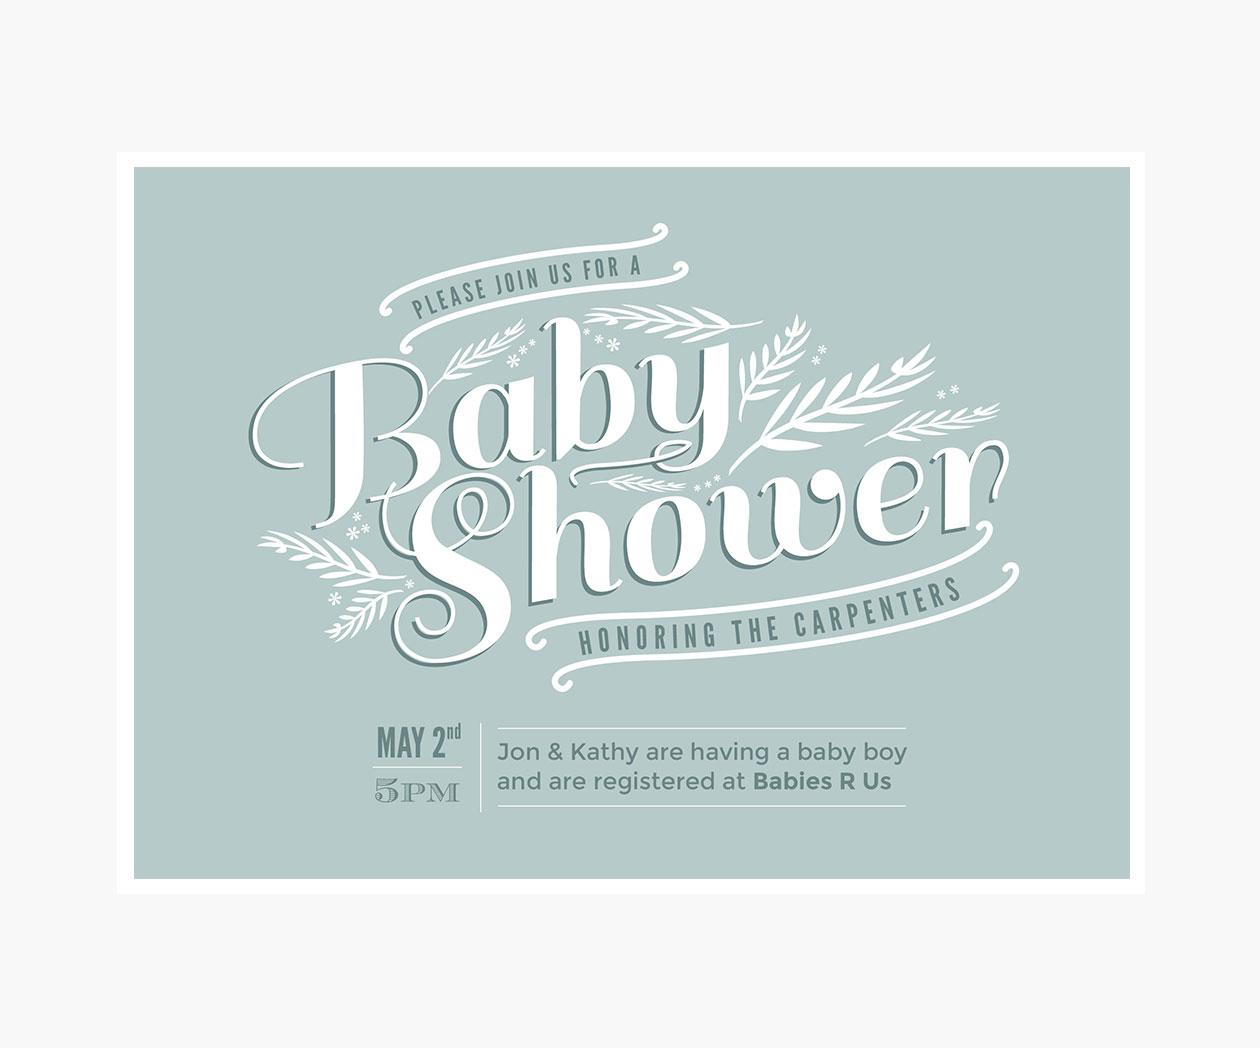 baby_shower.jpg